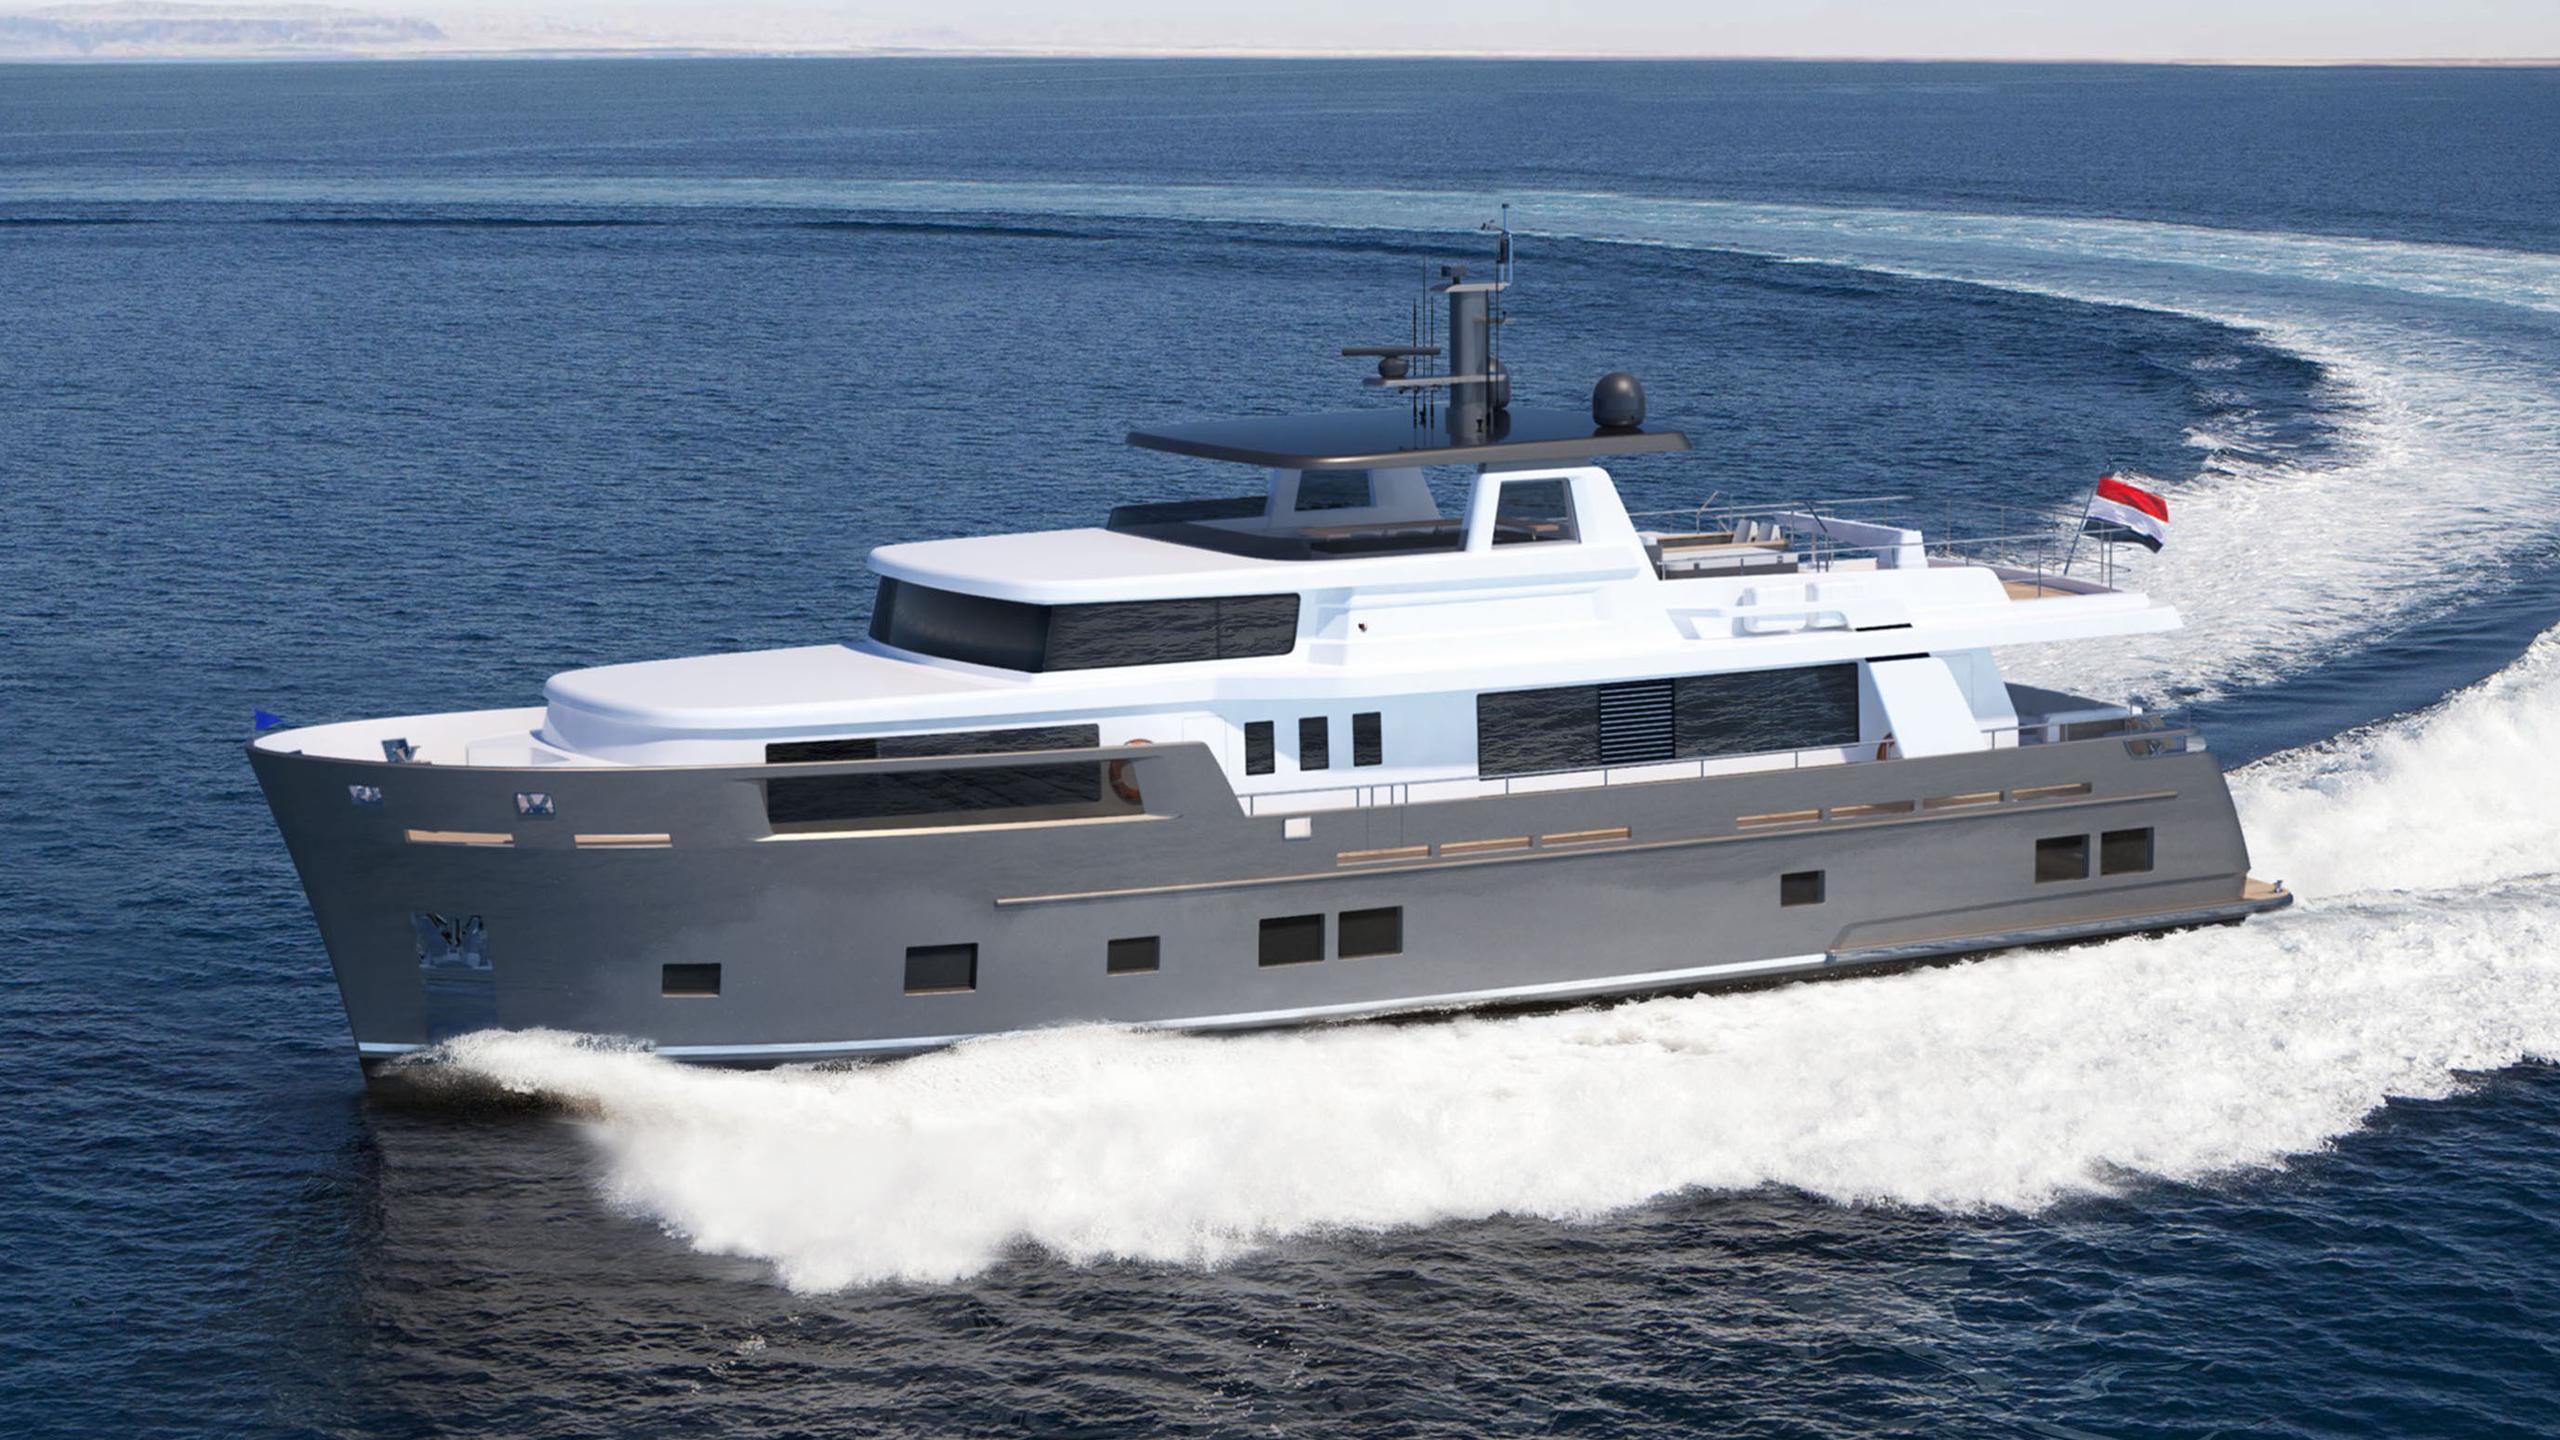 explorer vw0122 motoryacht van der valk 28m 2020 rendering